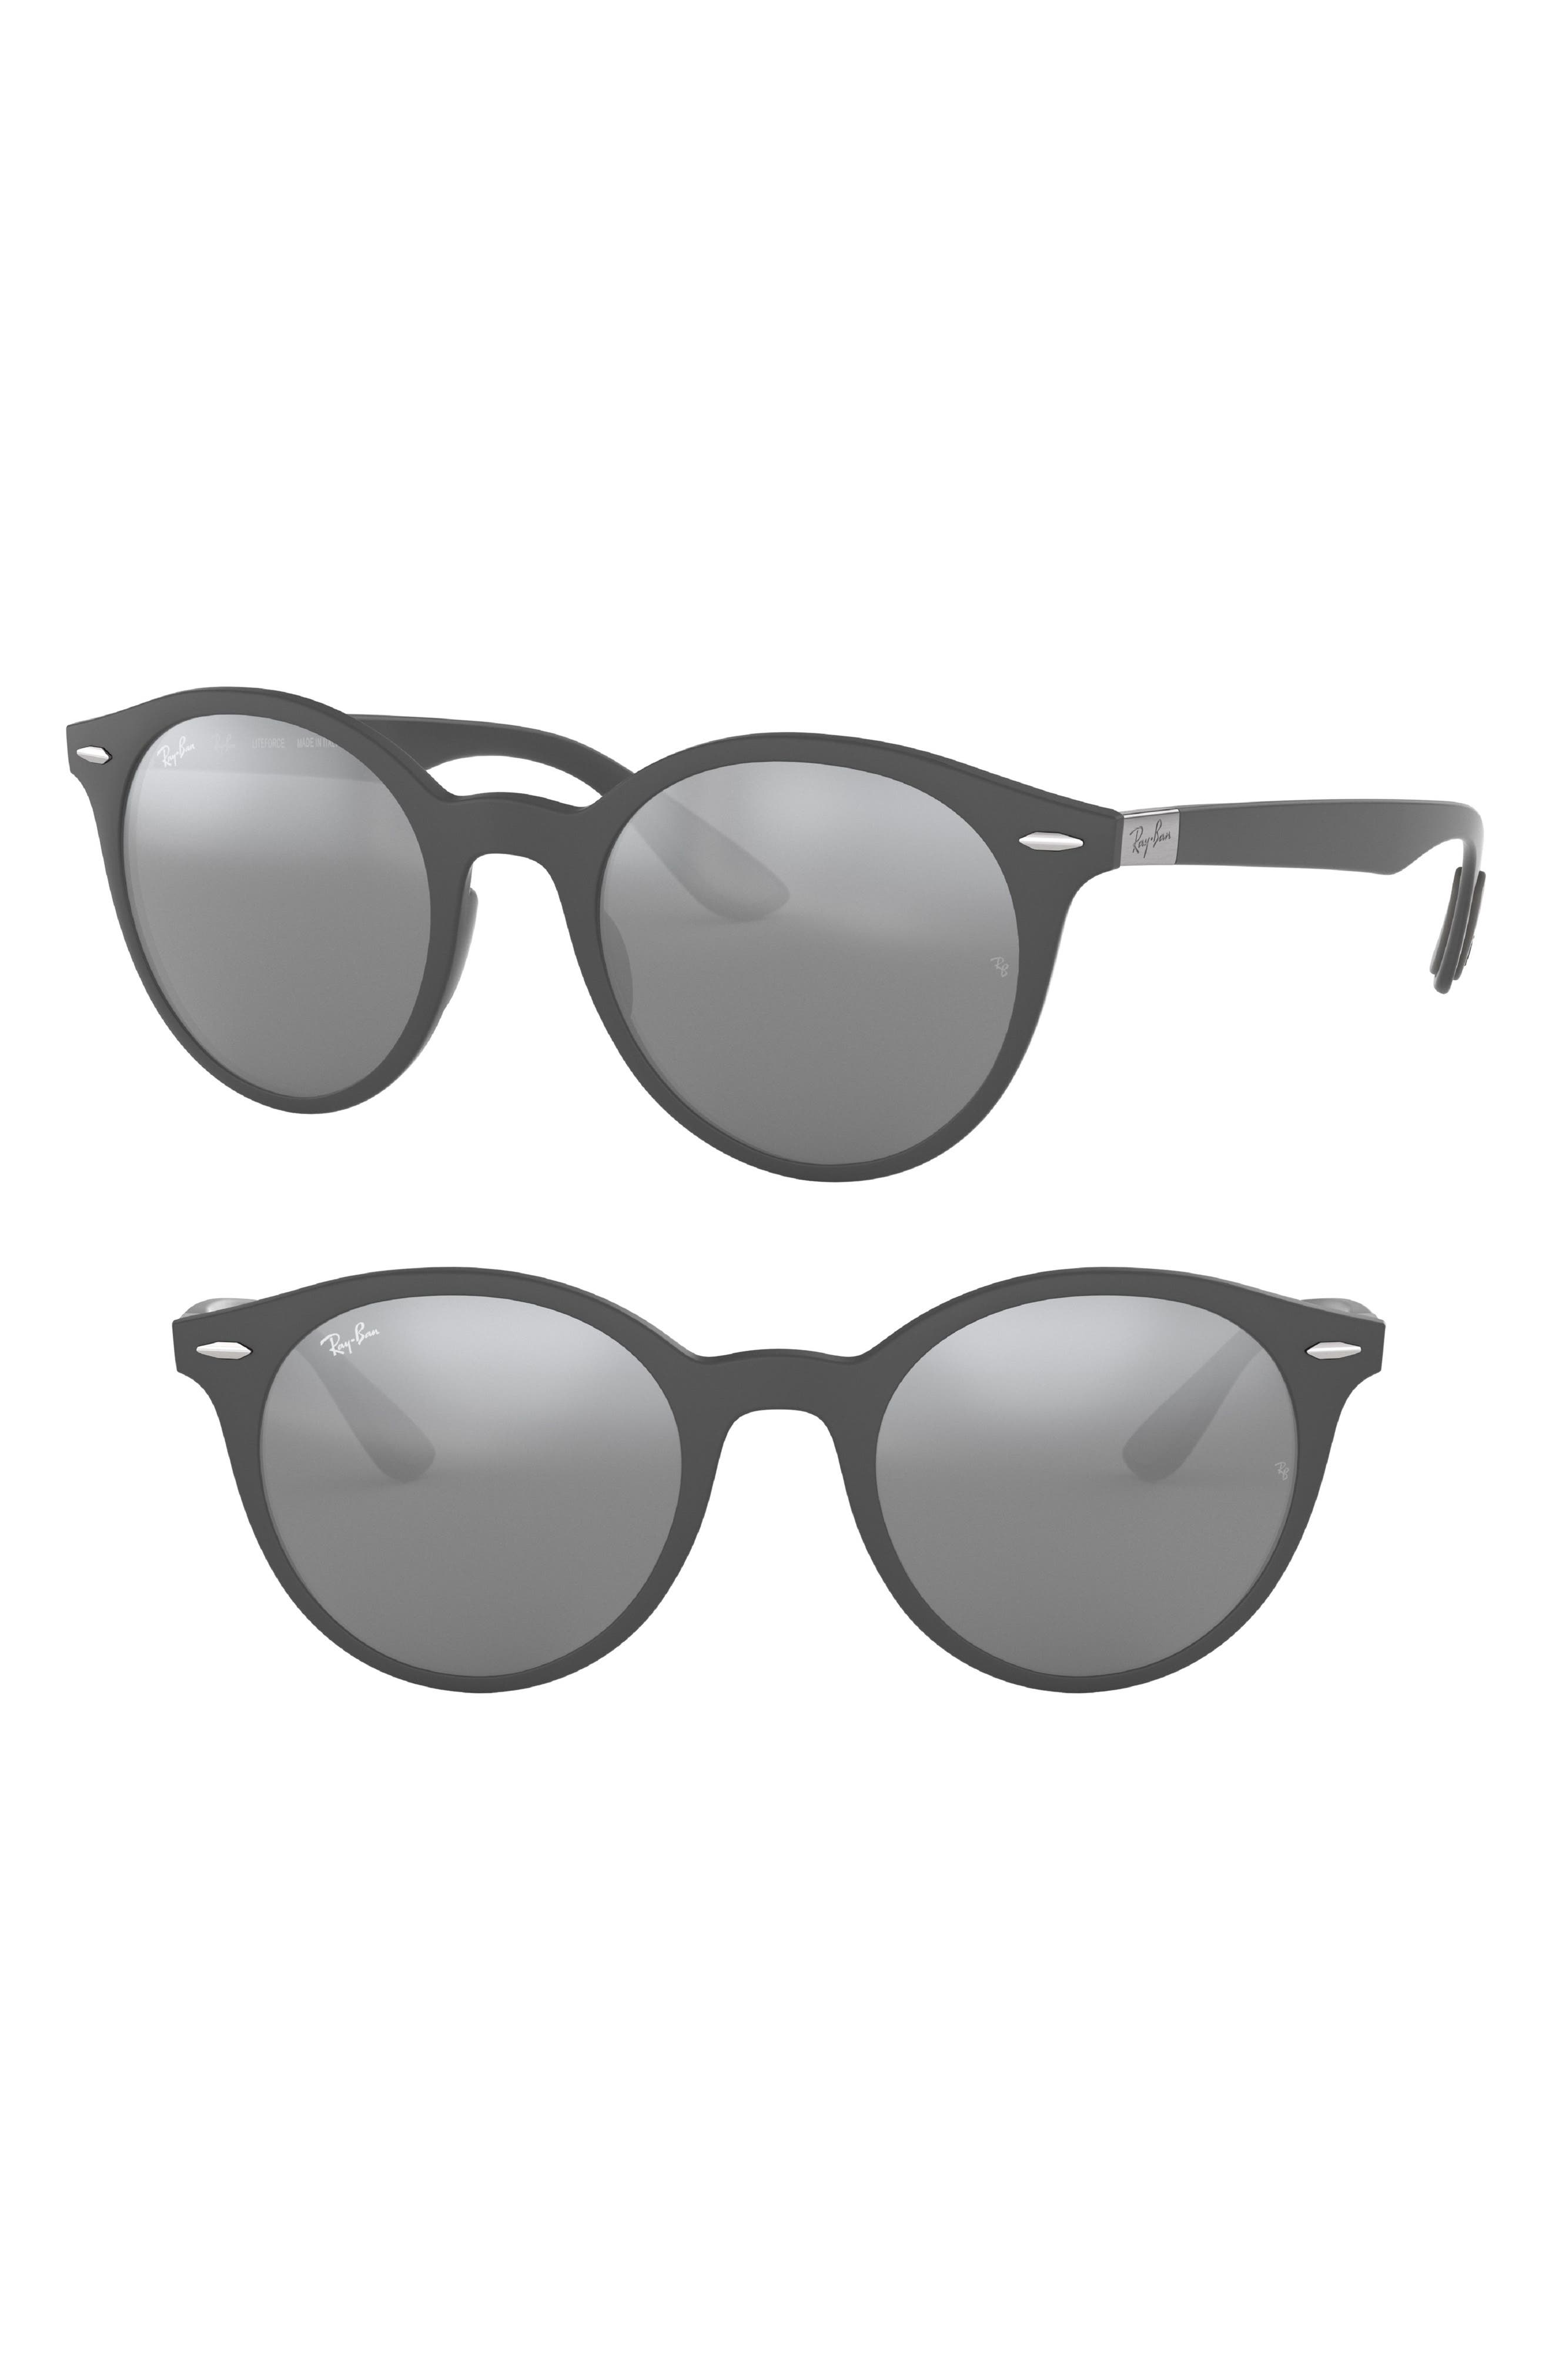 Ray-Ban Phantos 50Mm Mirrored Sunglasses - Dark Grey